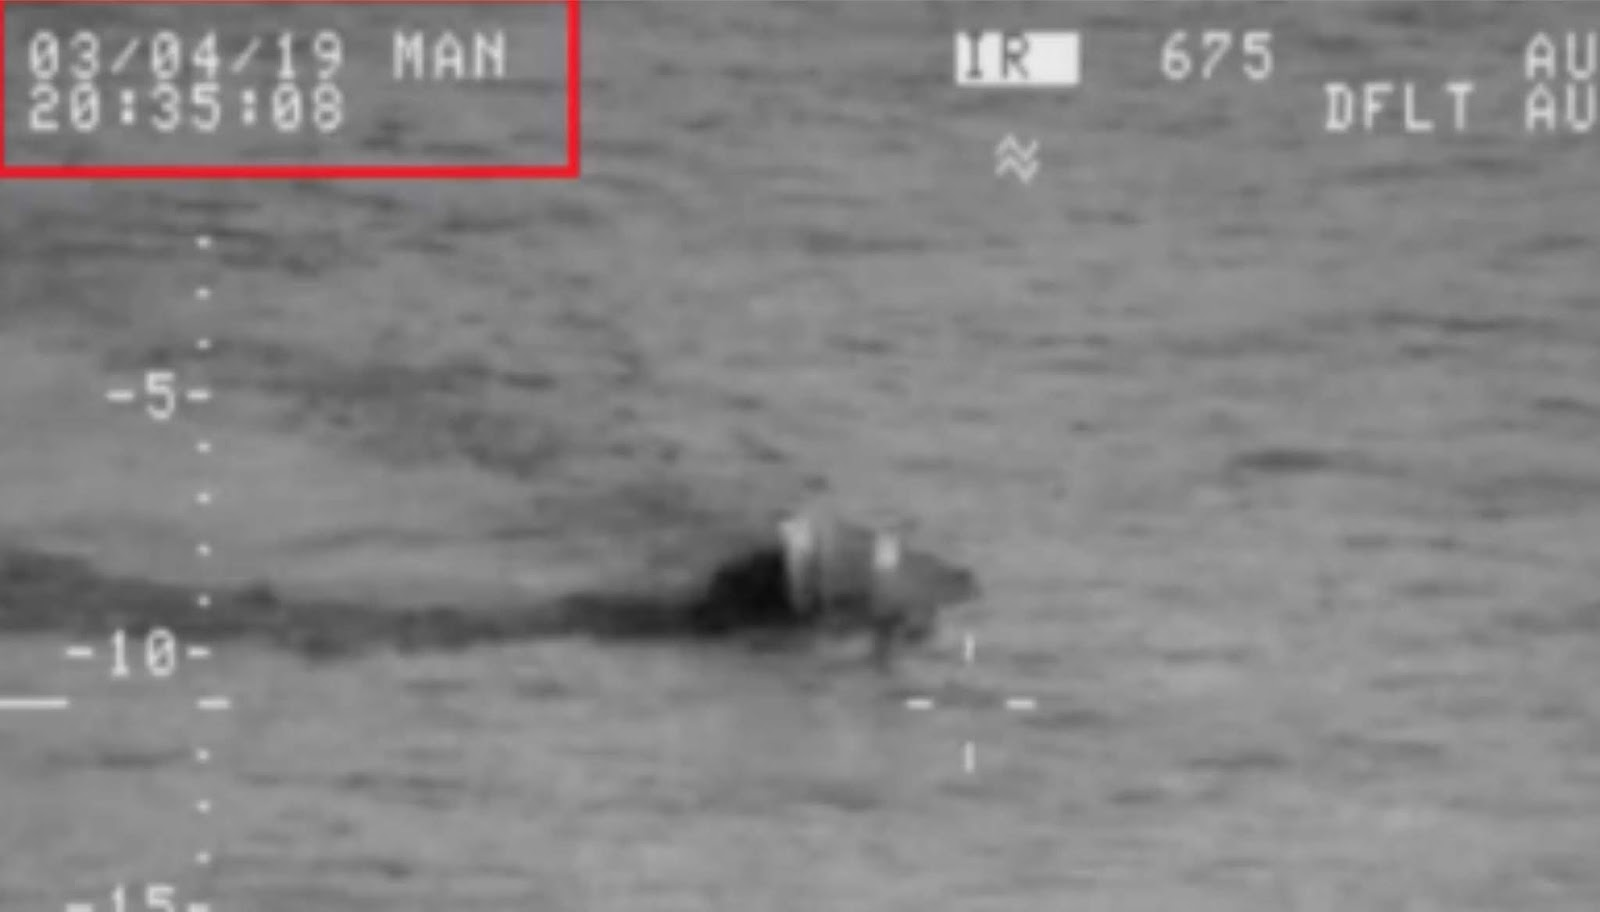 Angkatan Laut Pakistan mengklaim telah mencegah upaya kapal selam India melanggar perbatasannya